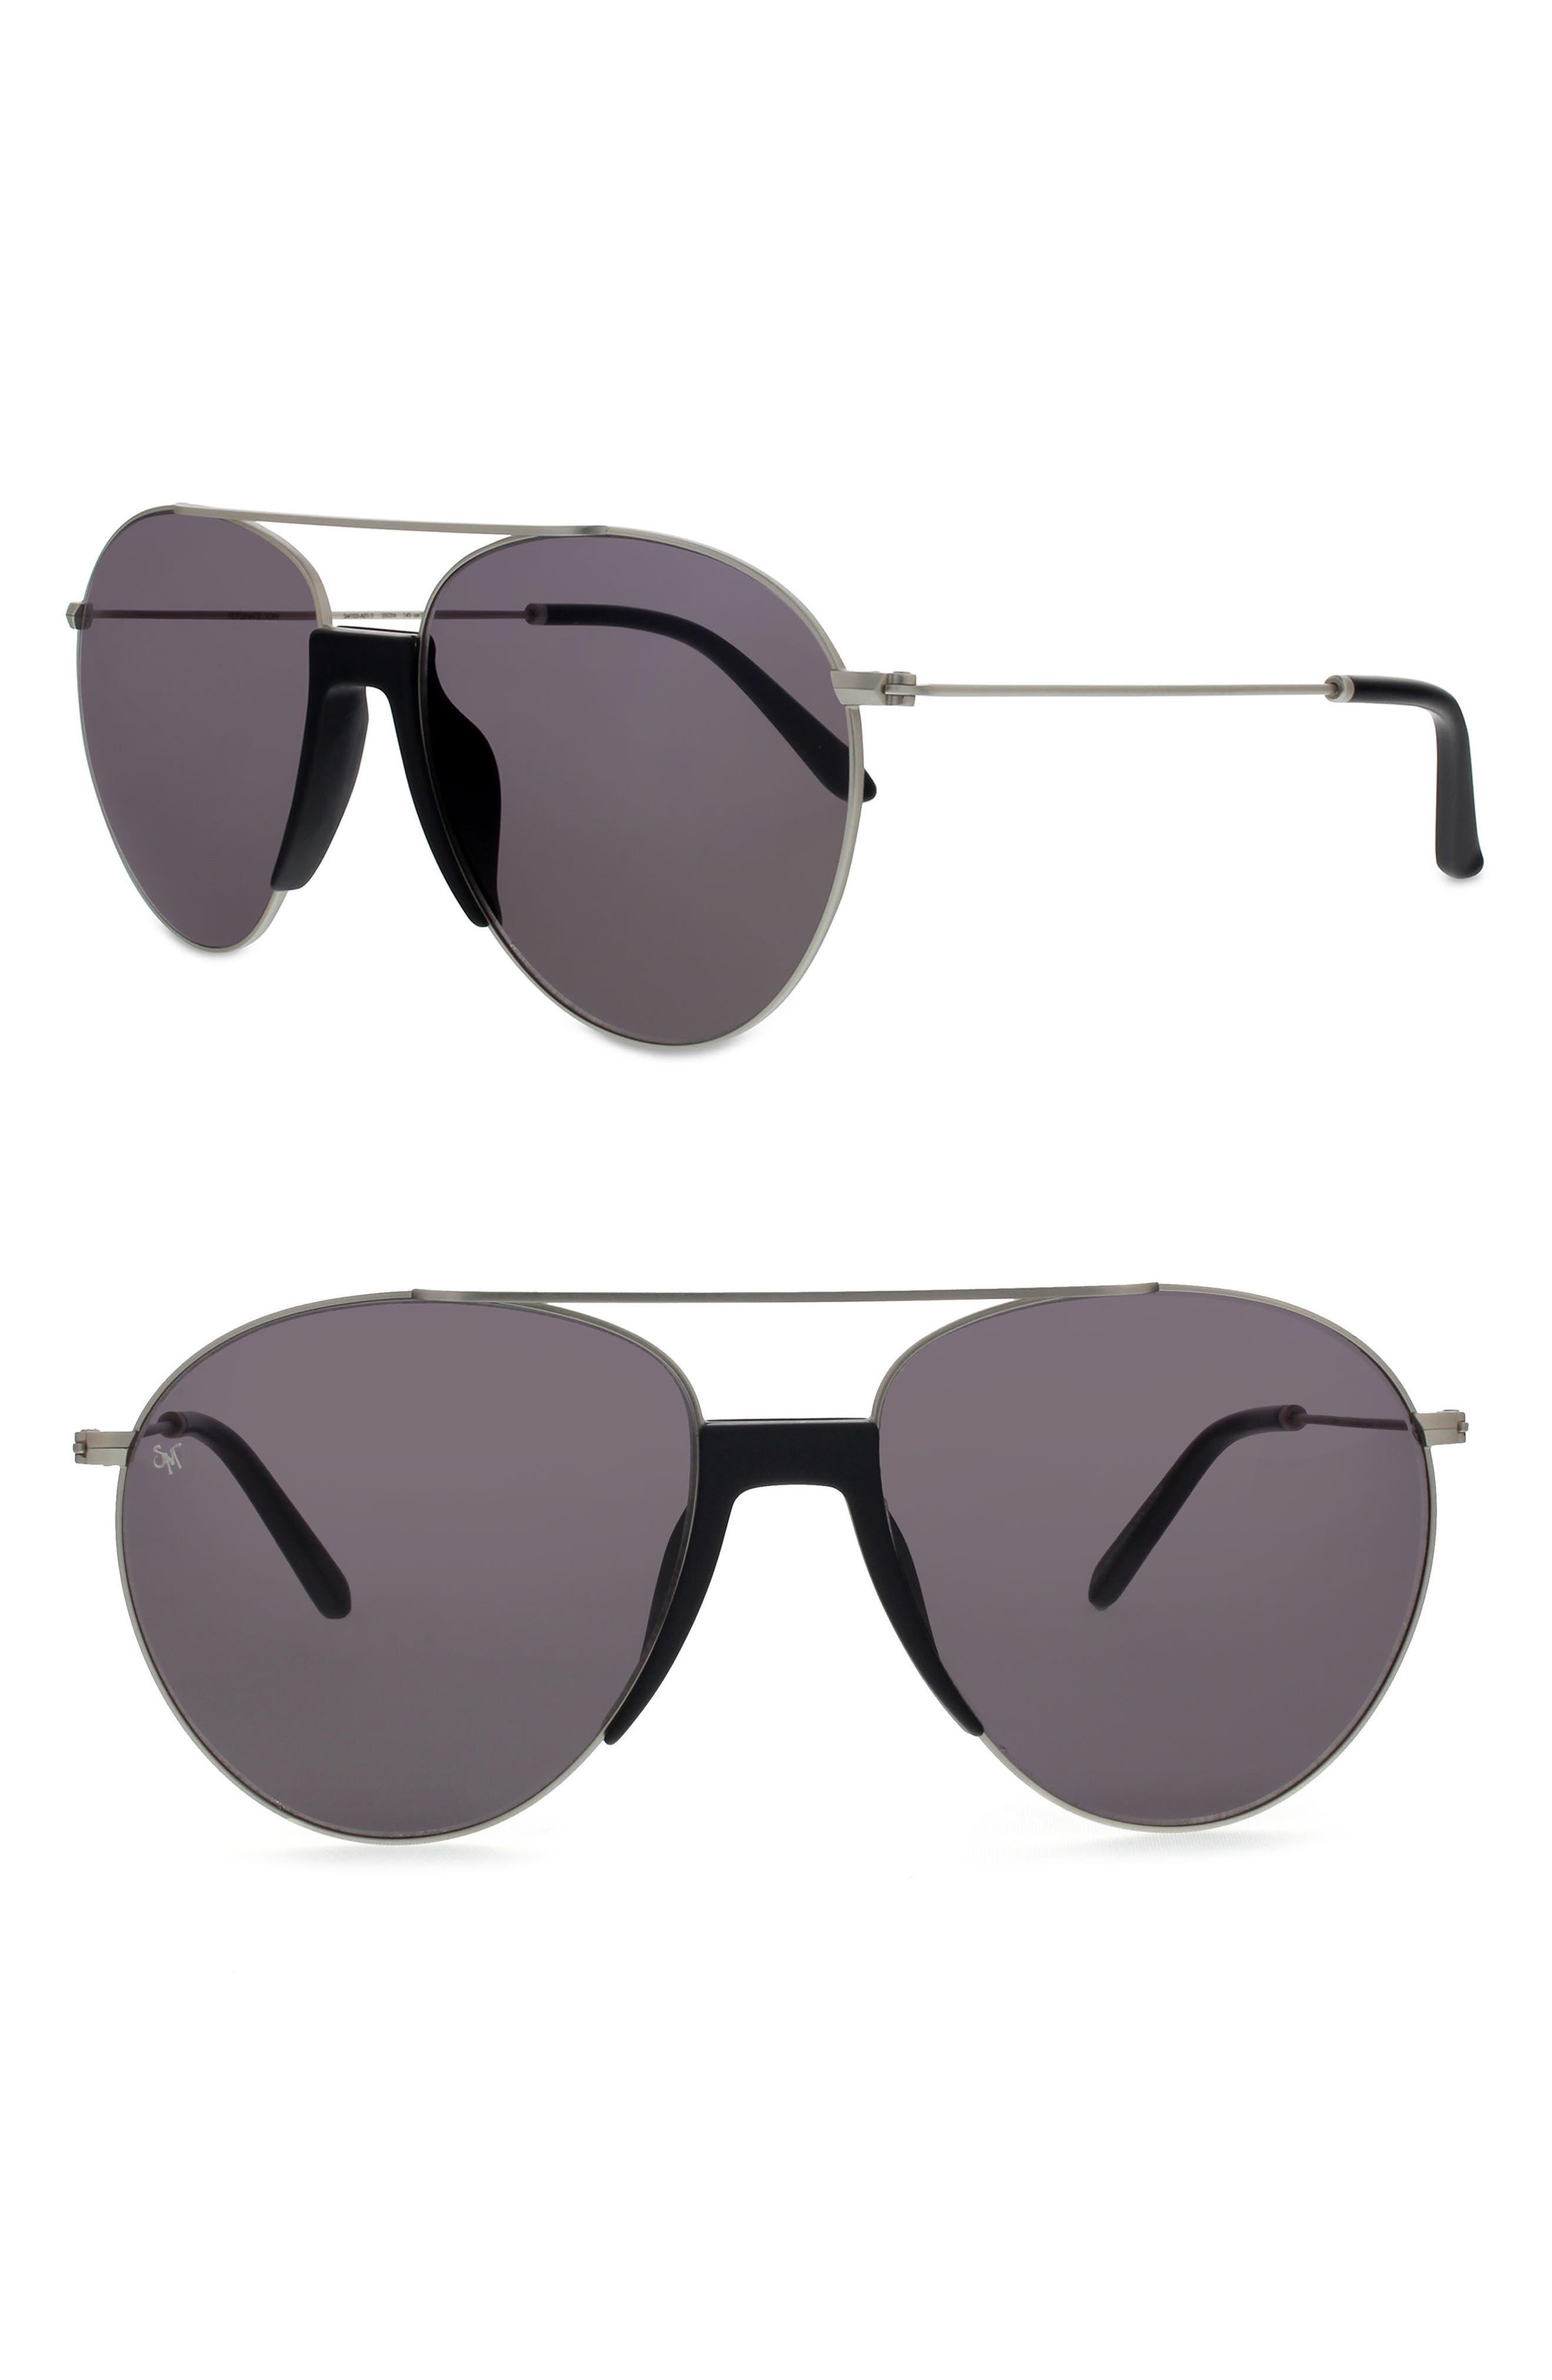 093cd077e04 Smoke X Mirrors Sunglasses for Women